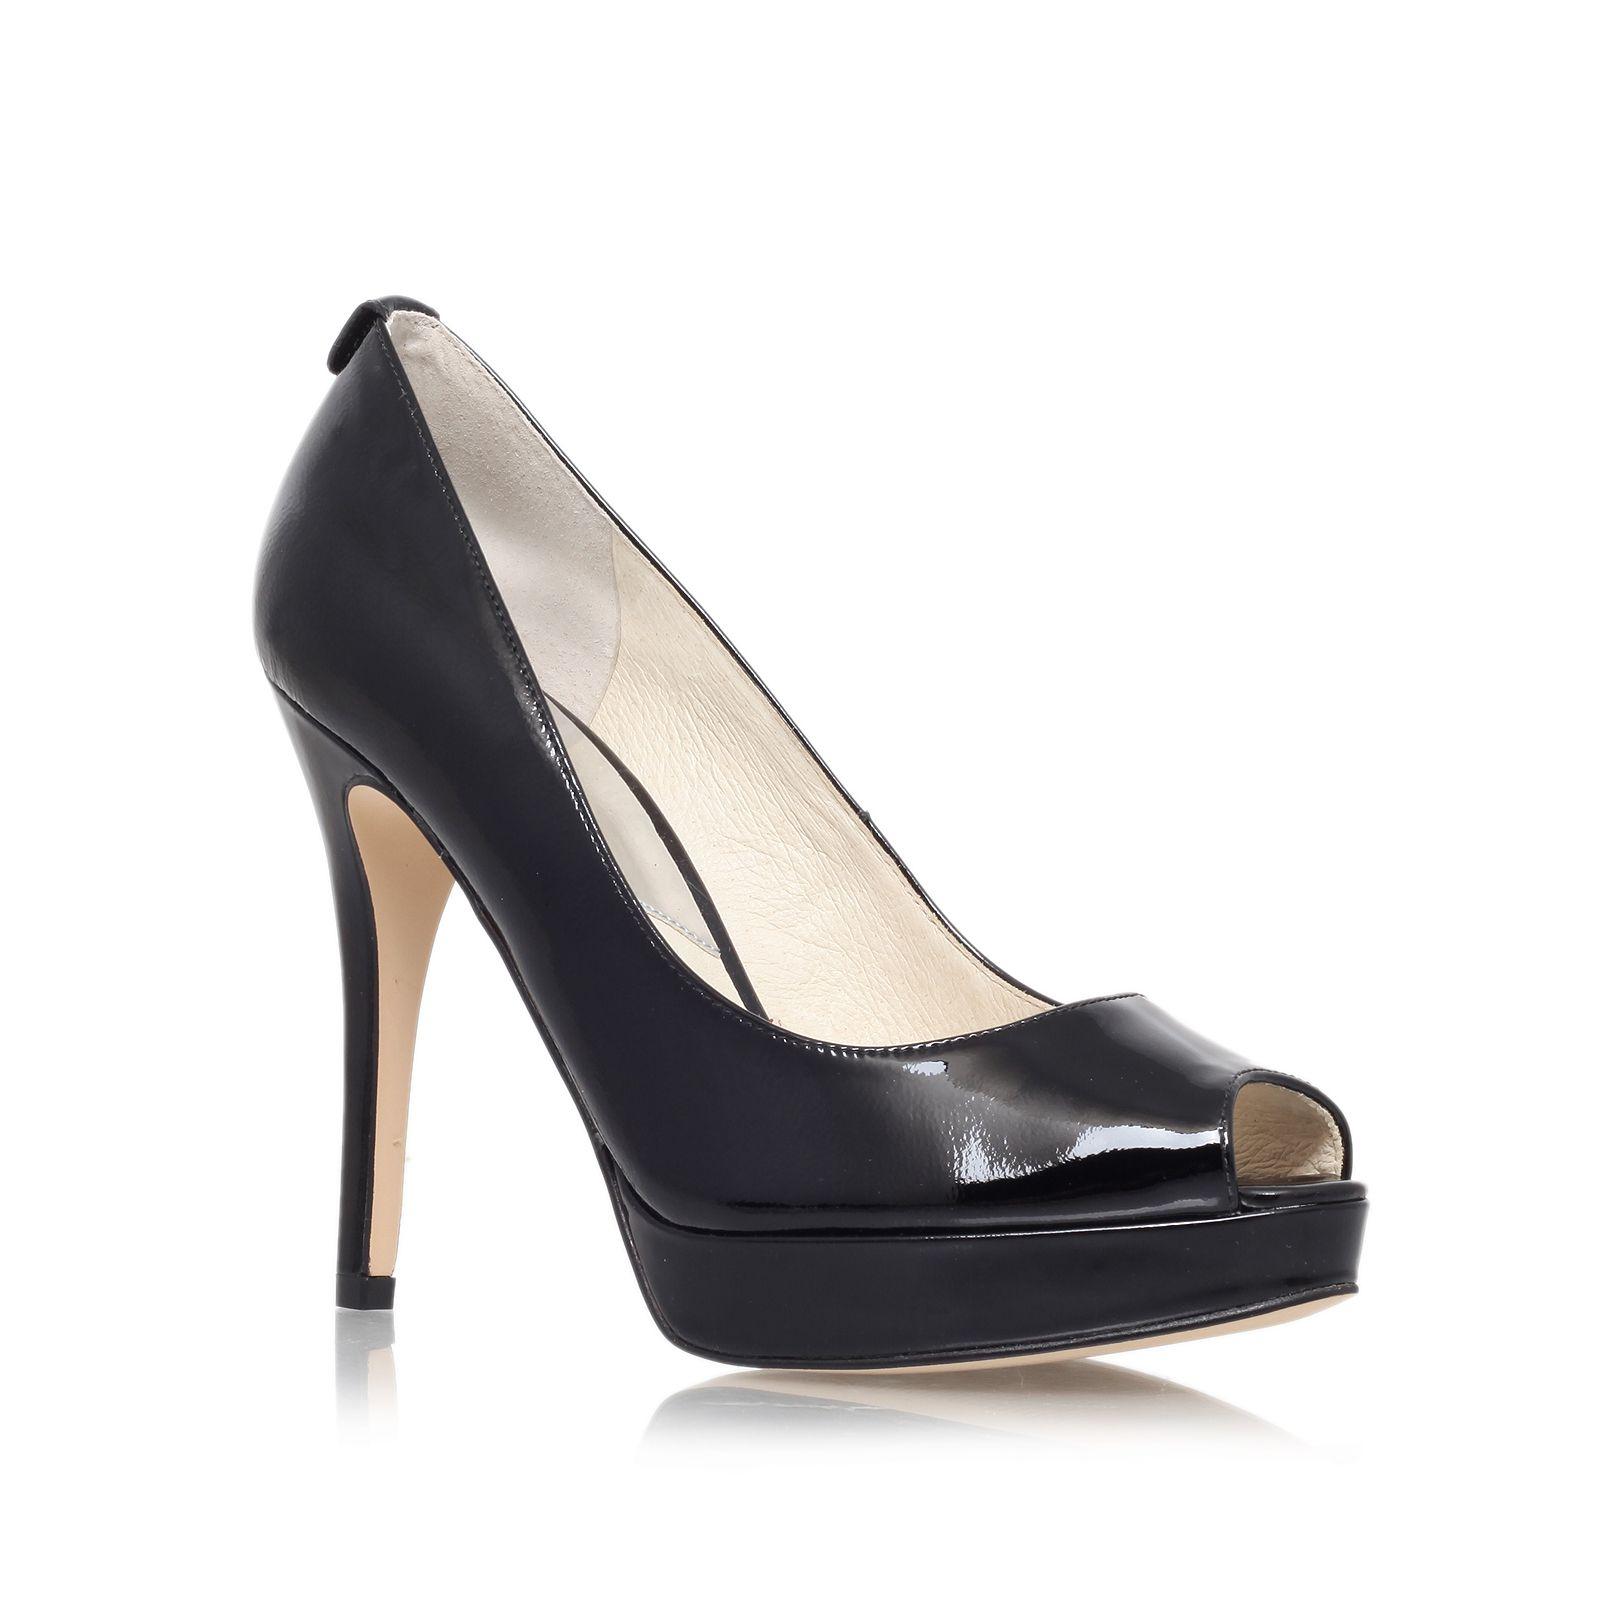 michael kors york platform peep toe court shoes in black